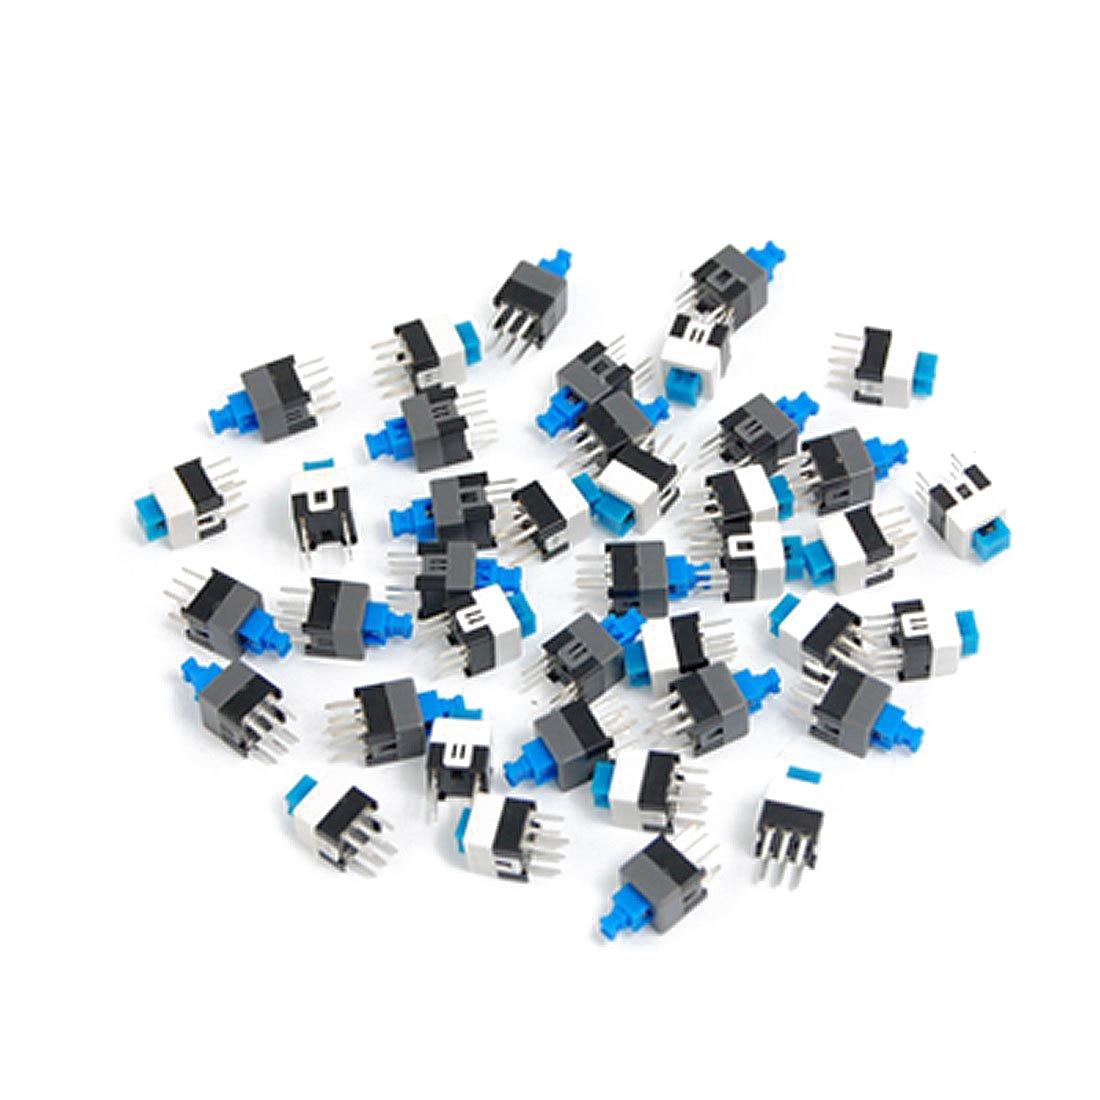 Promotion! 40 Pcs 7 x 7mm PCB Tact Tactile Push Button Switch Self Lock 6 Pin DIP 7 x 7mm x 16mm black cap push button tactile tact switch lock 6 pin dip